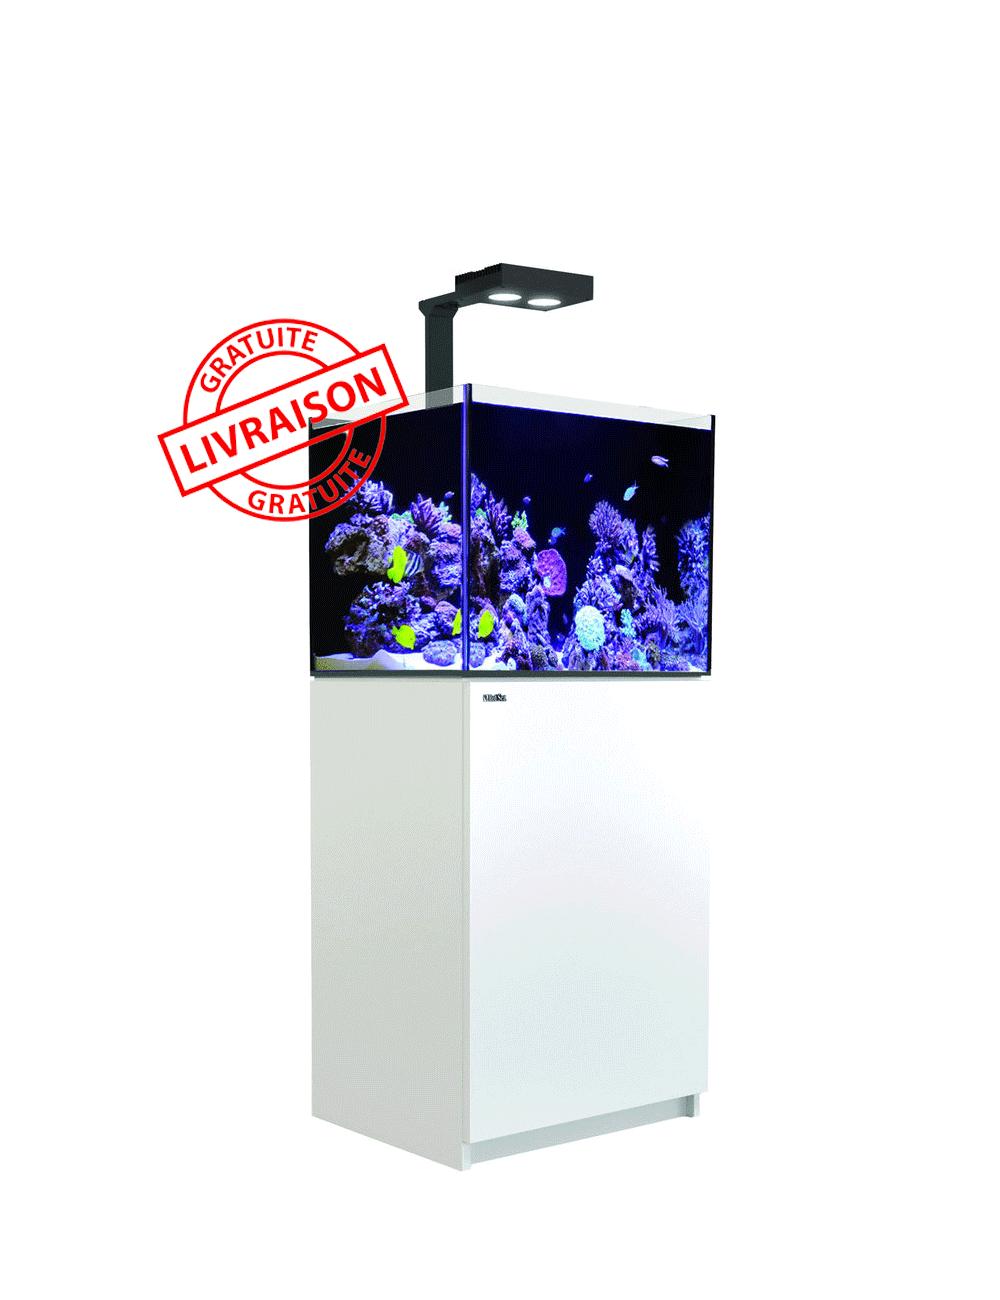 RED SEA - Aquarium Max® E-170 + LED AI Hydra 26™ HD - Meuble blanc  + Décantation - 170 litres